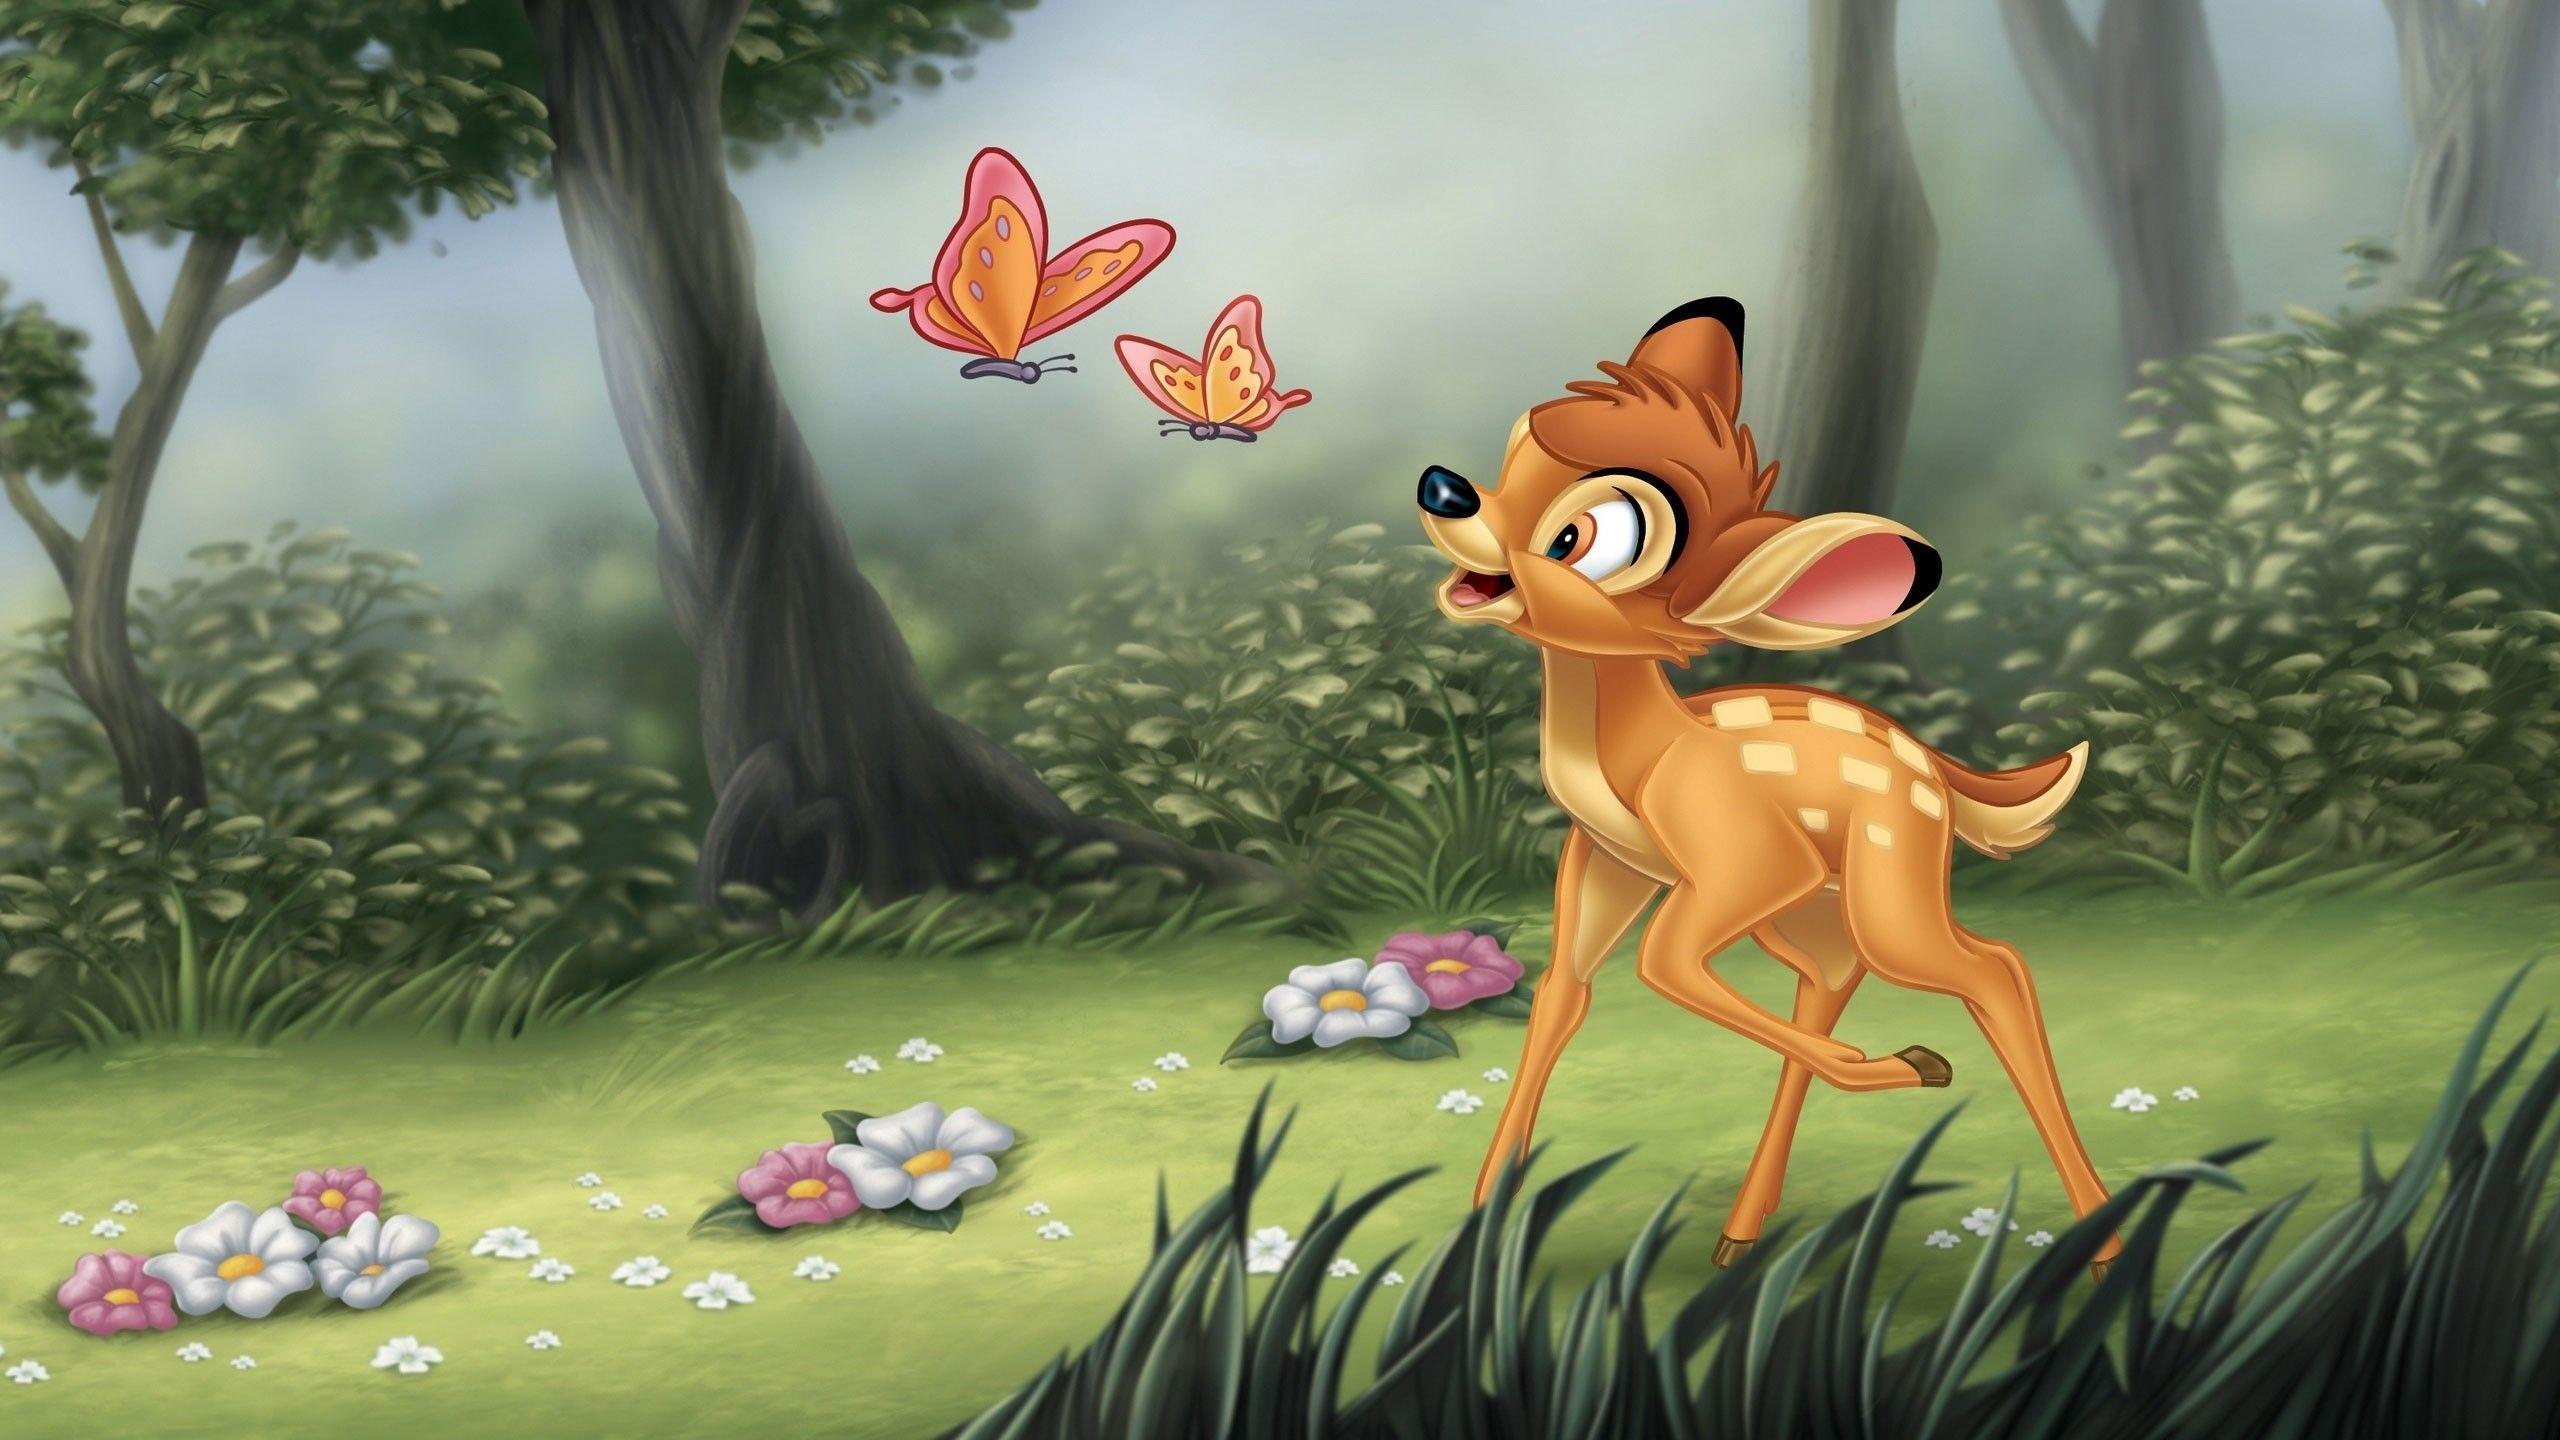 62 Best Free 3d Cute Disney Wallpapers Wallpaperaccess